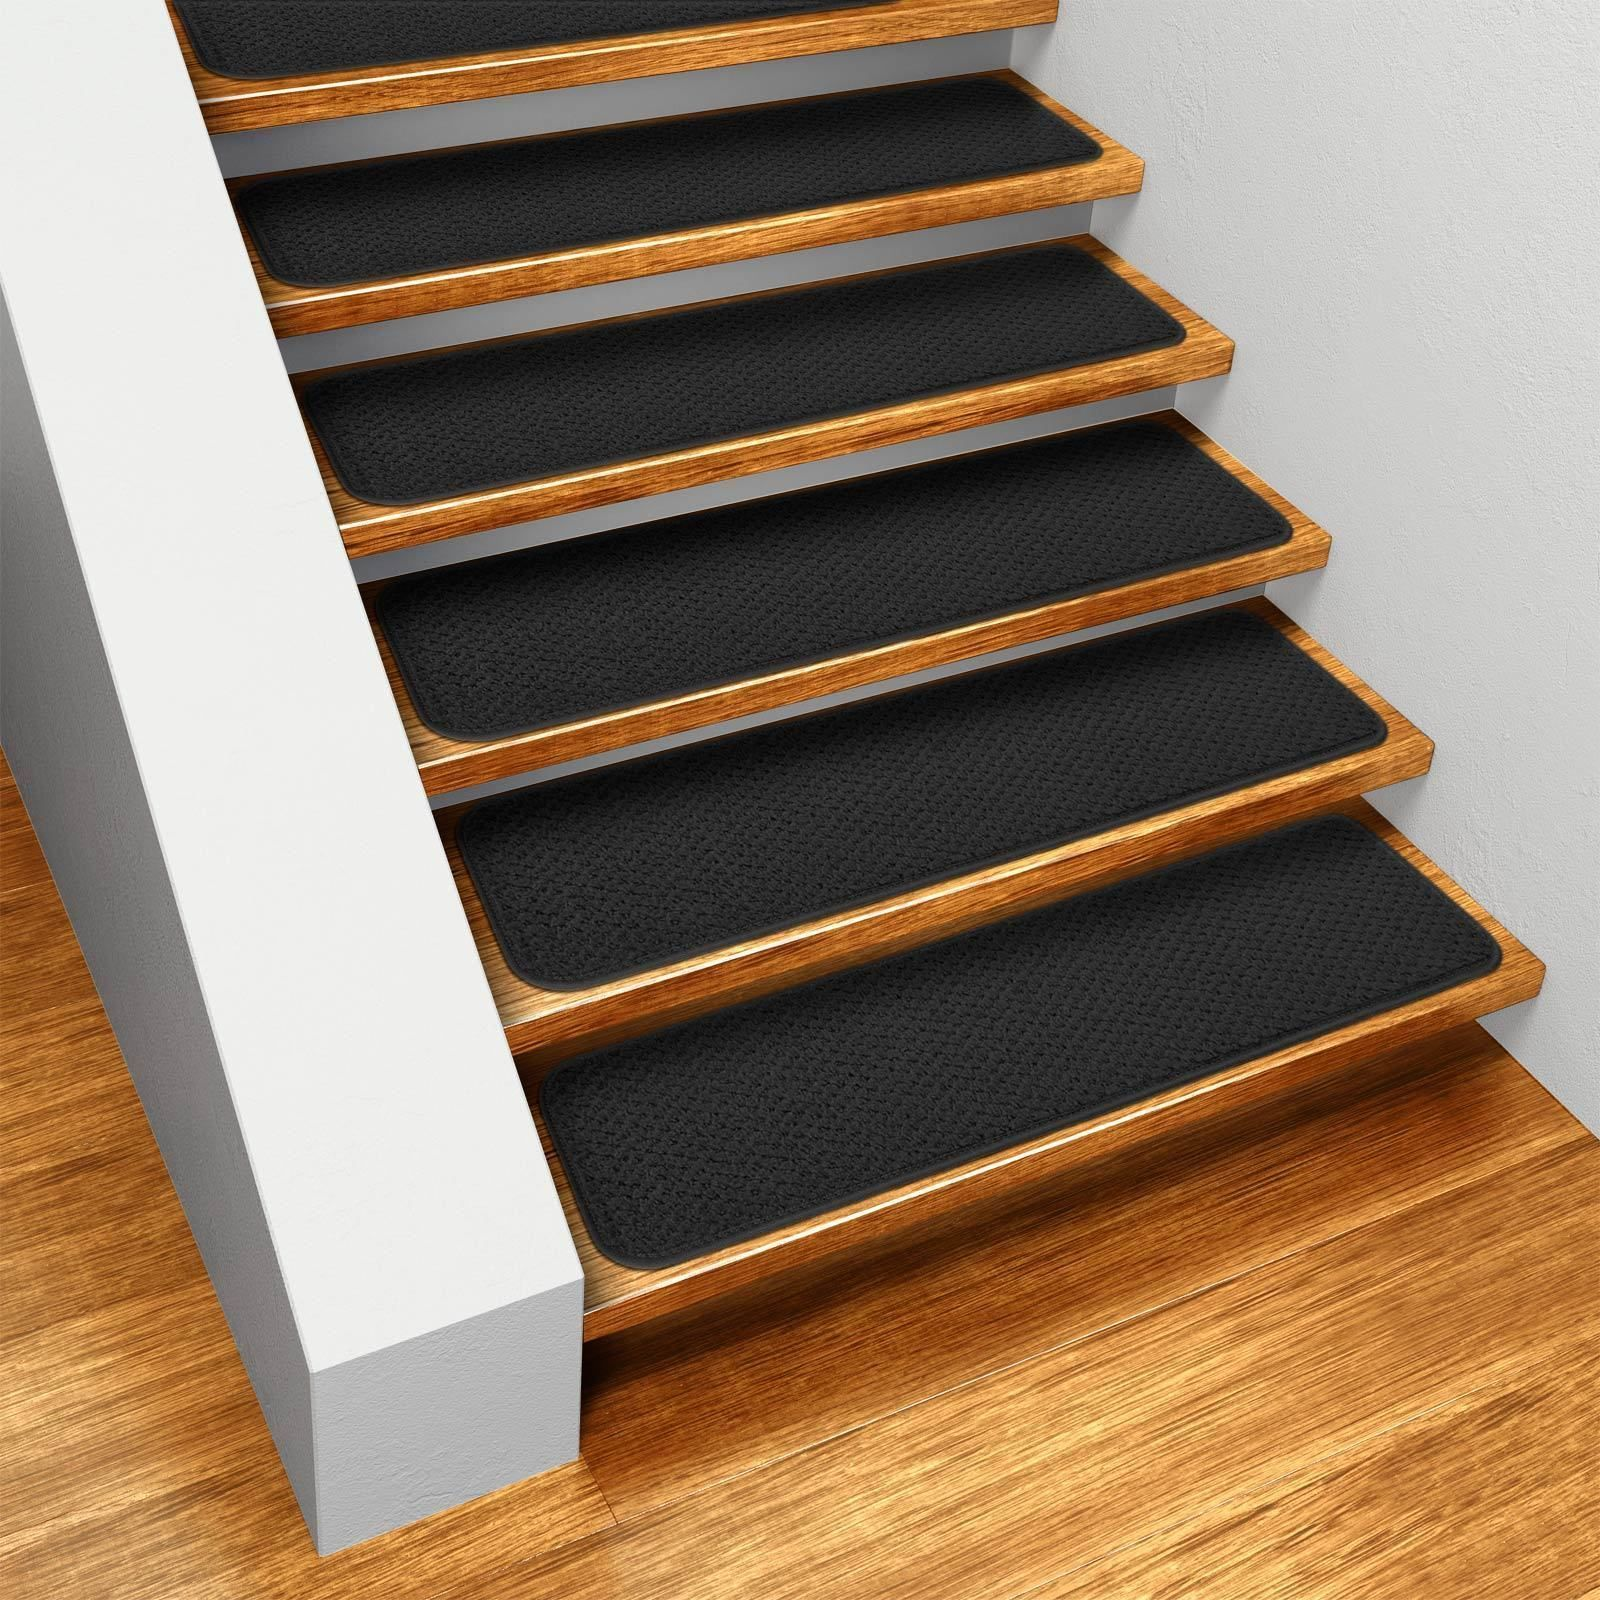 Best Set Of 15 Skid Resistant Carpet Stair Treads Black 640 x 480